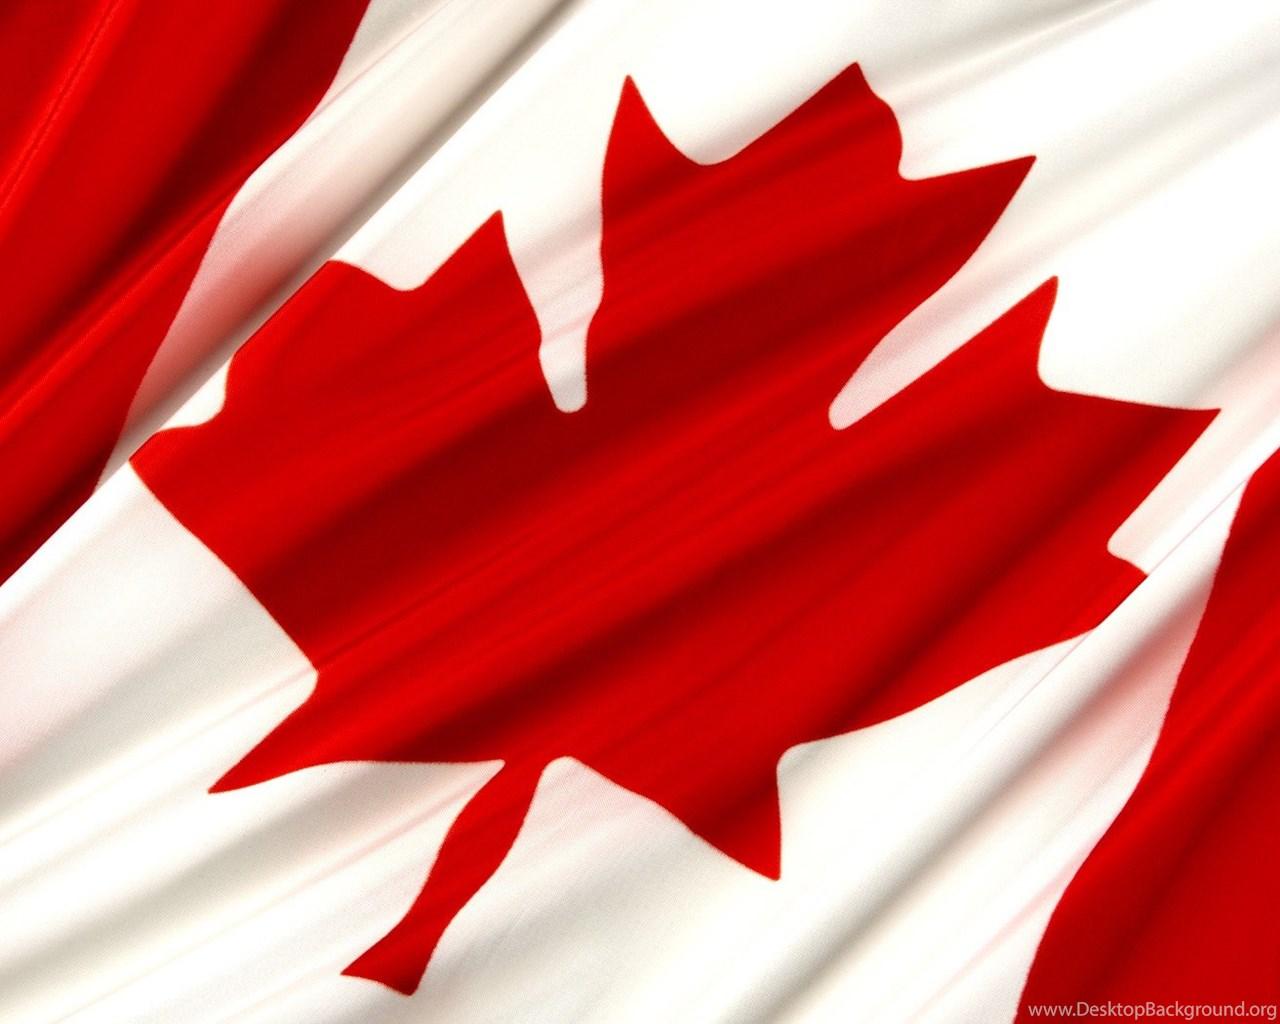 Canada flag canada flag wallpapers high quality fine hd - Canada flag wallpaper hd for iphone ...